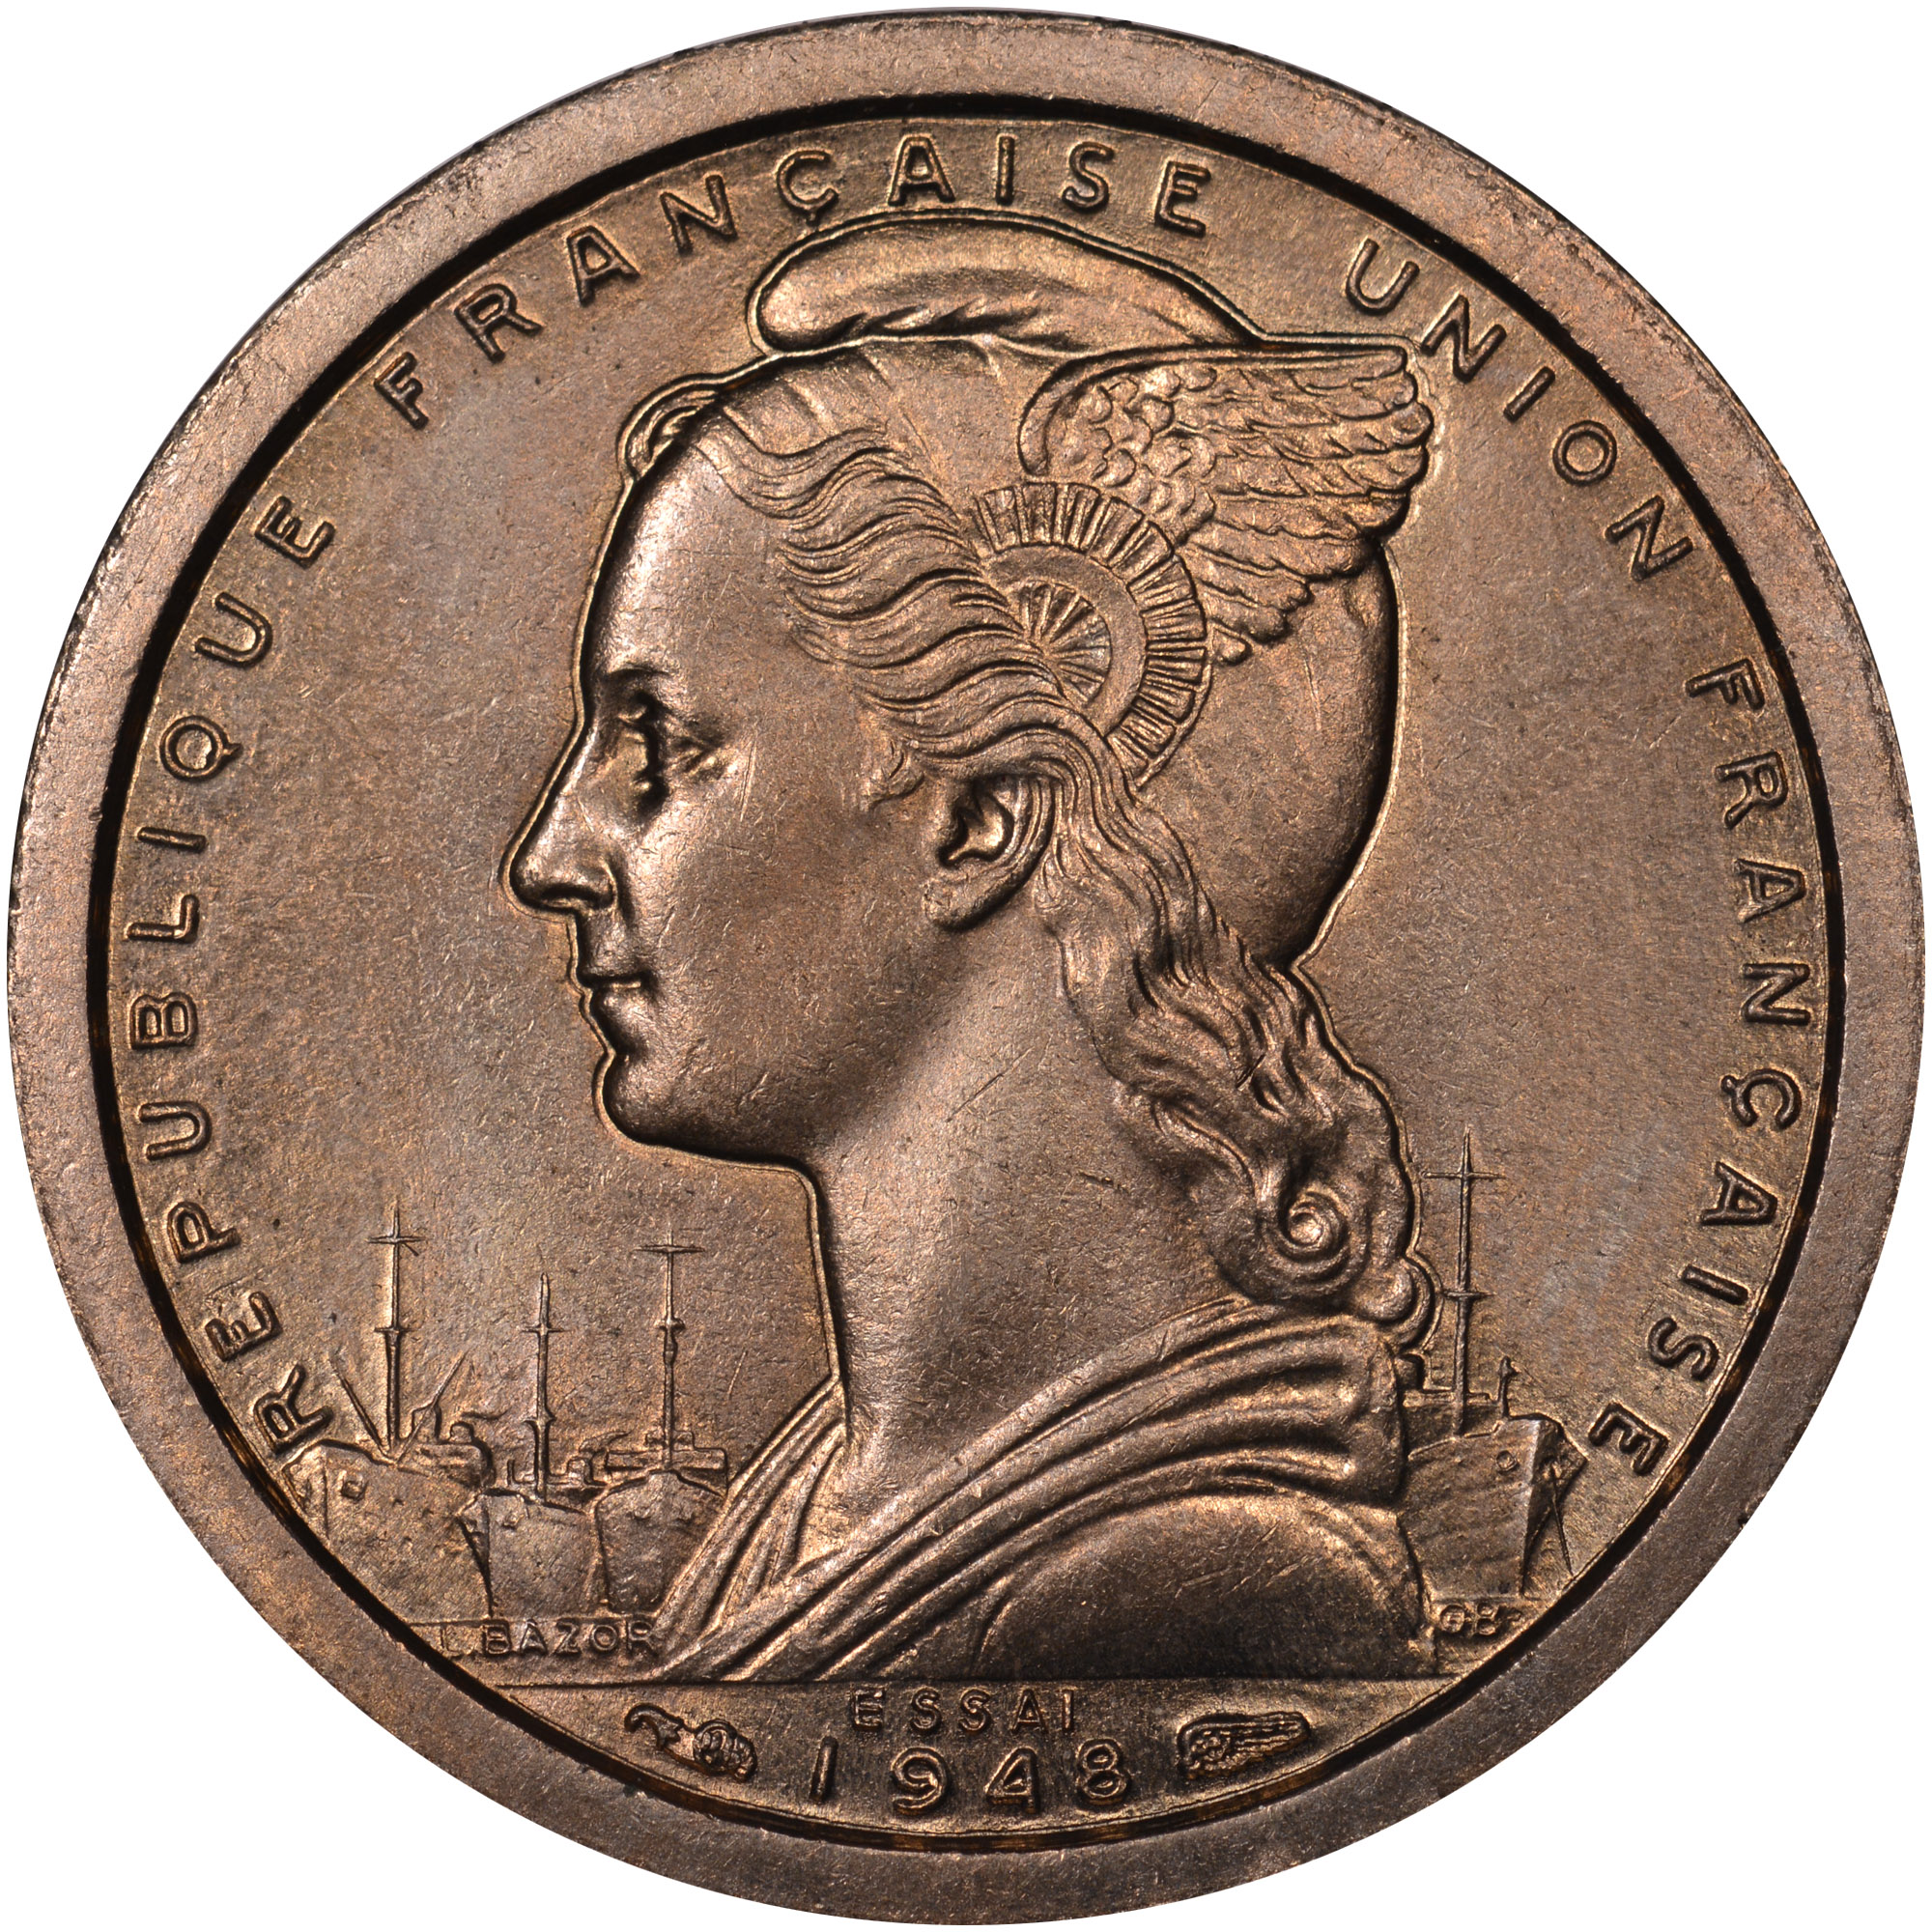 1948 Cameroon Franc obverse